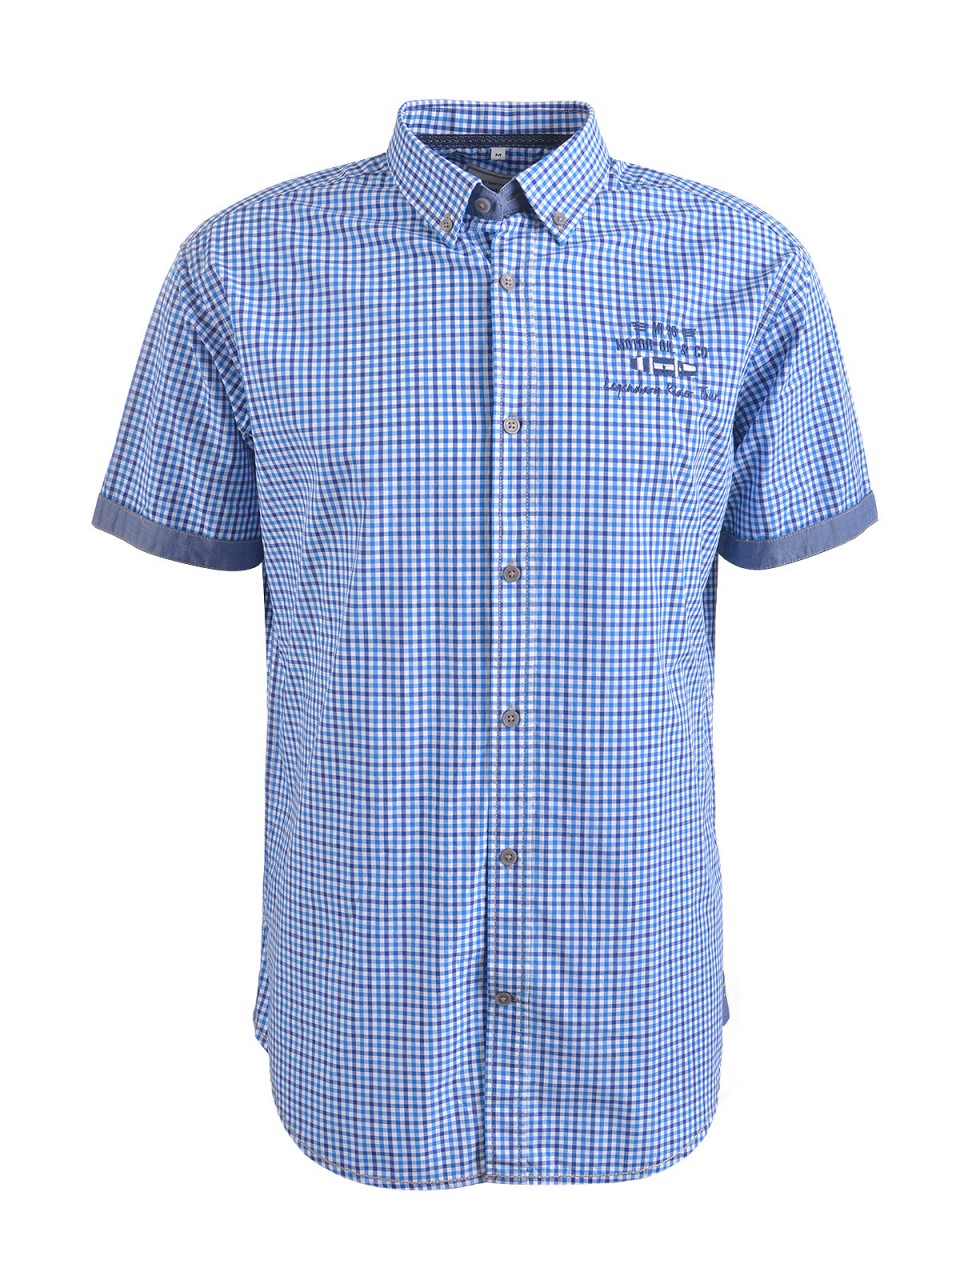 milano-italy-herren-hemd-blau-wei-szlig-, 15.98 EUR @ designermode-com-mode